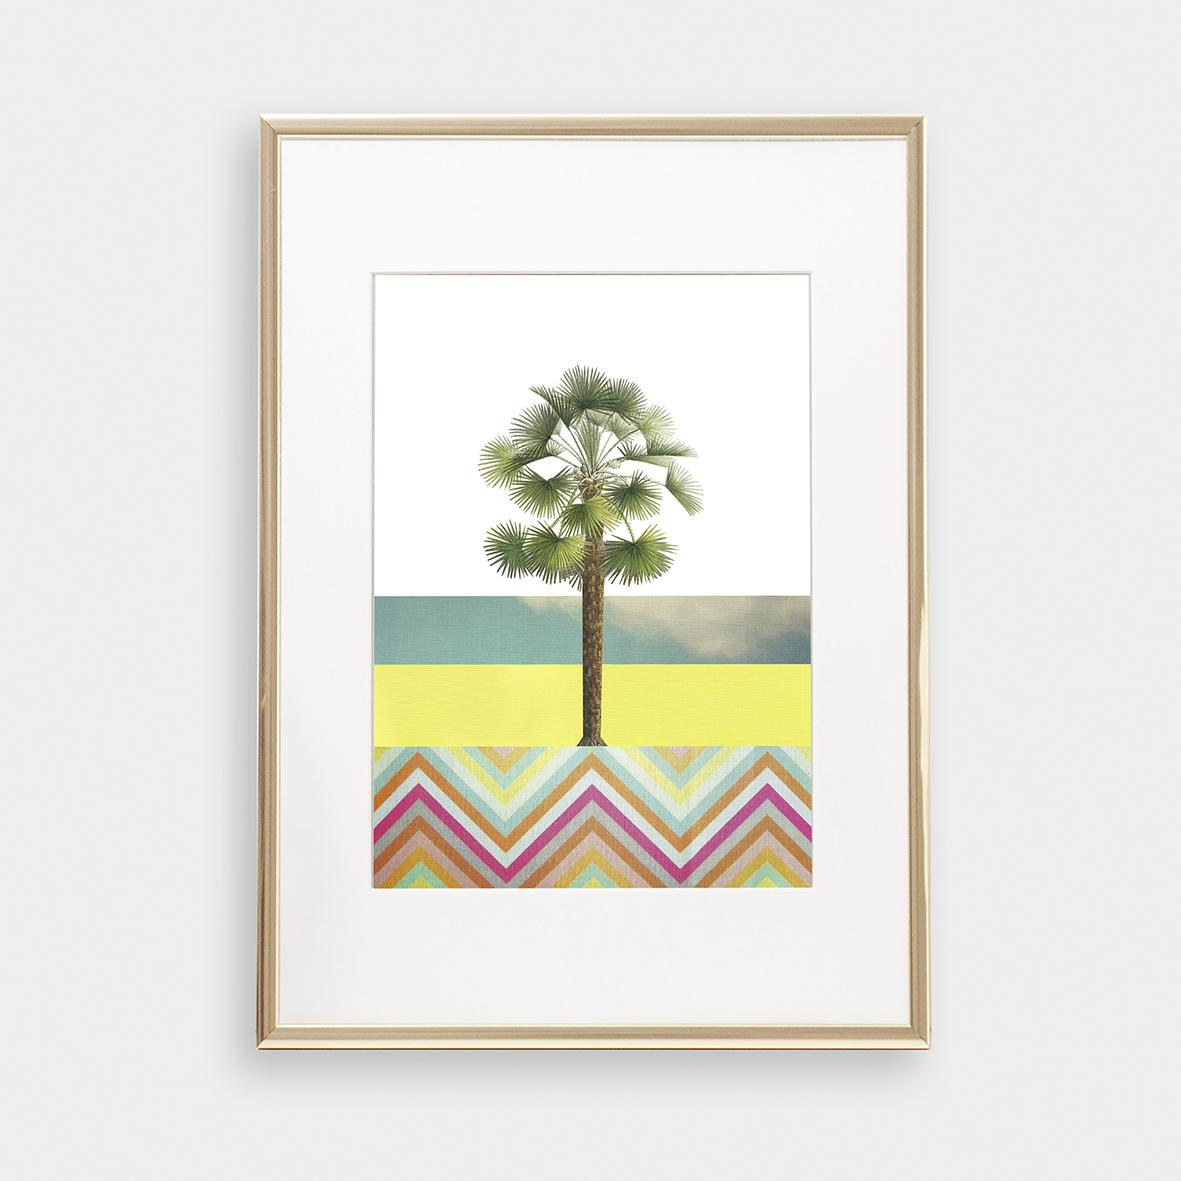 Palme 03 / Kunstdruck / Fine Art Print / Poster / Plakat